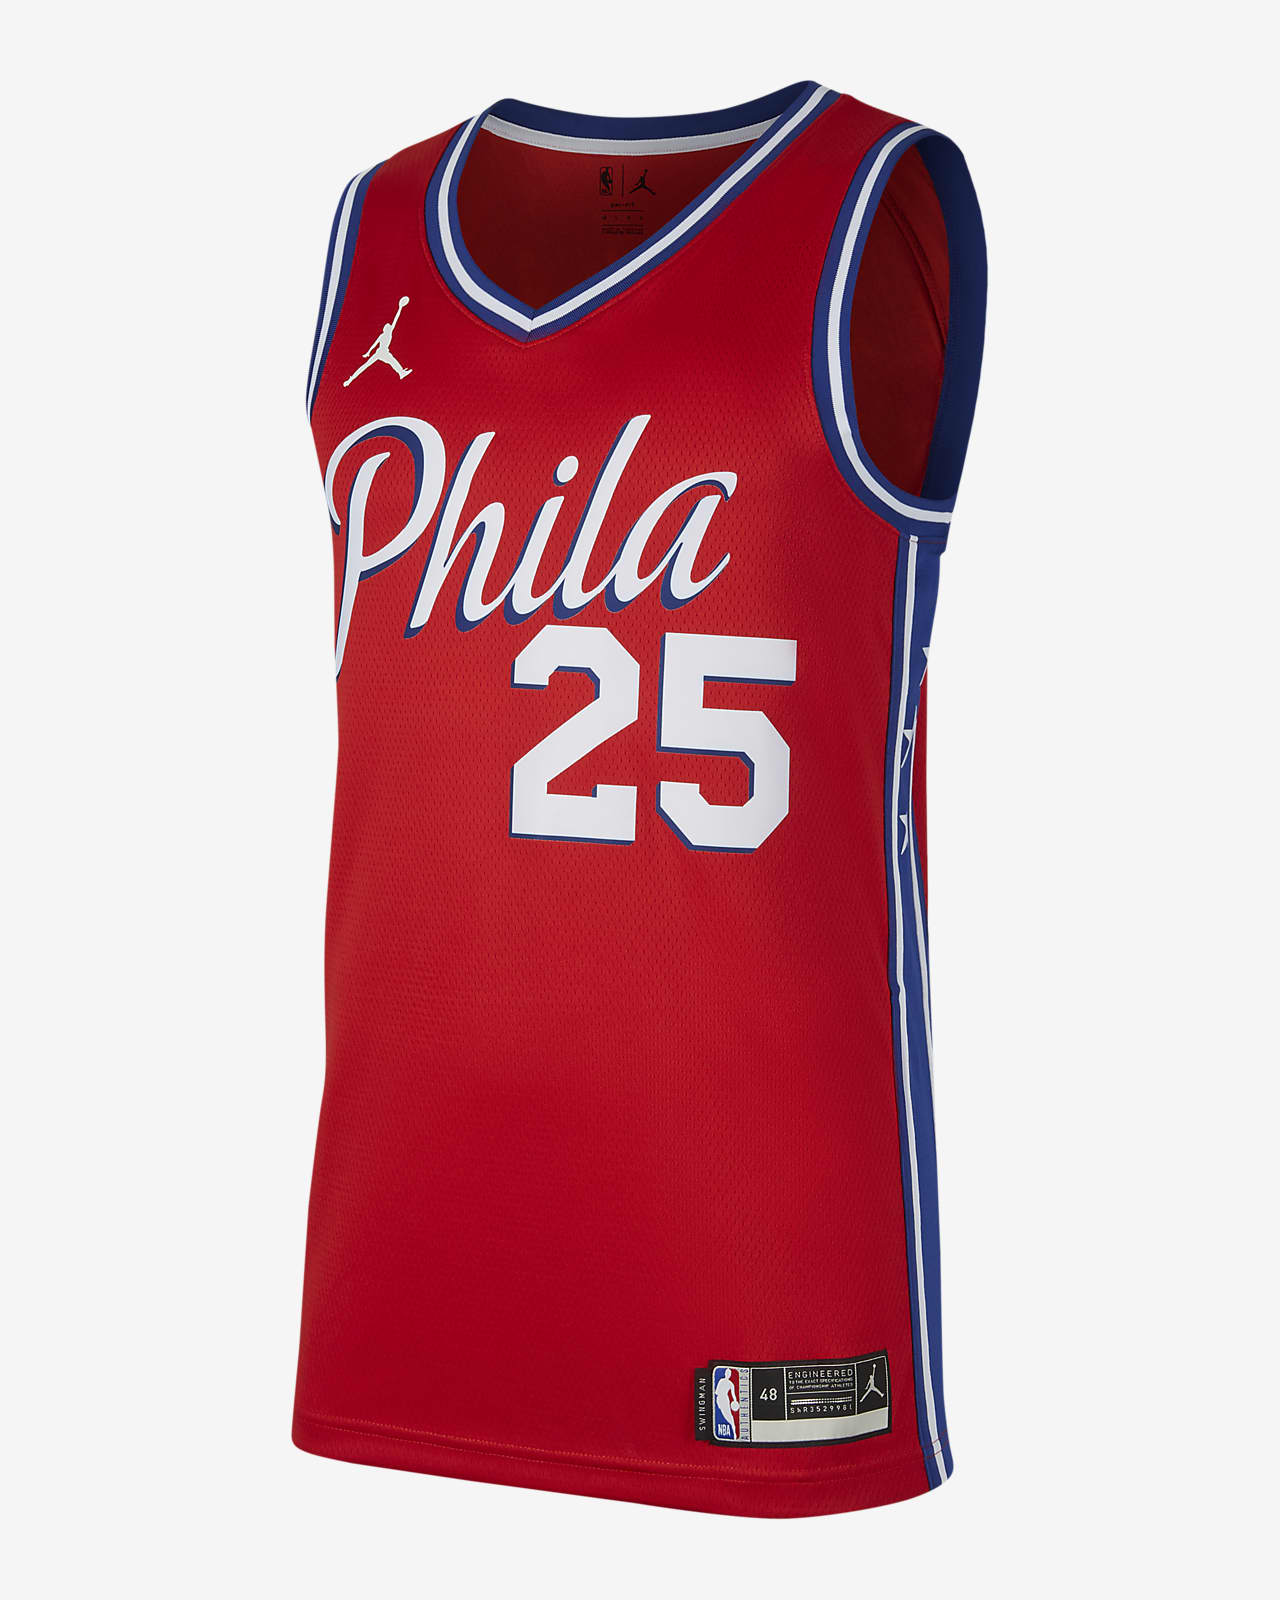 Ben Simmons 76ers Statement Edition 2020 Jordan NBA Swingman Jersey